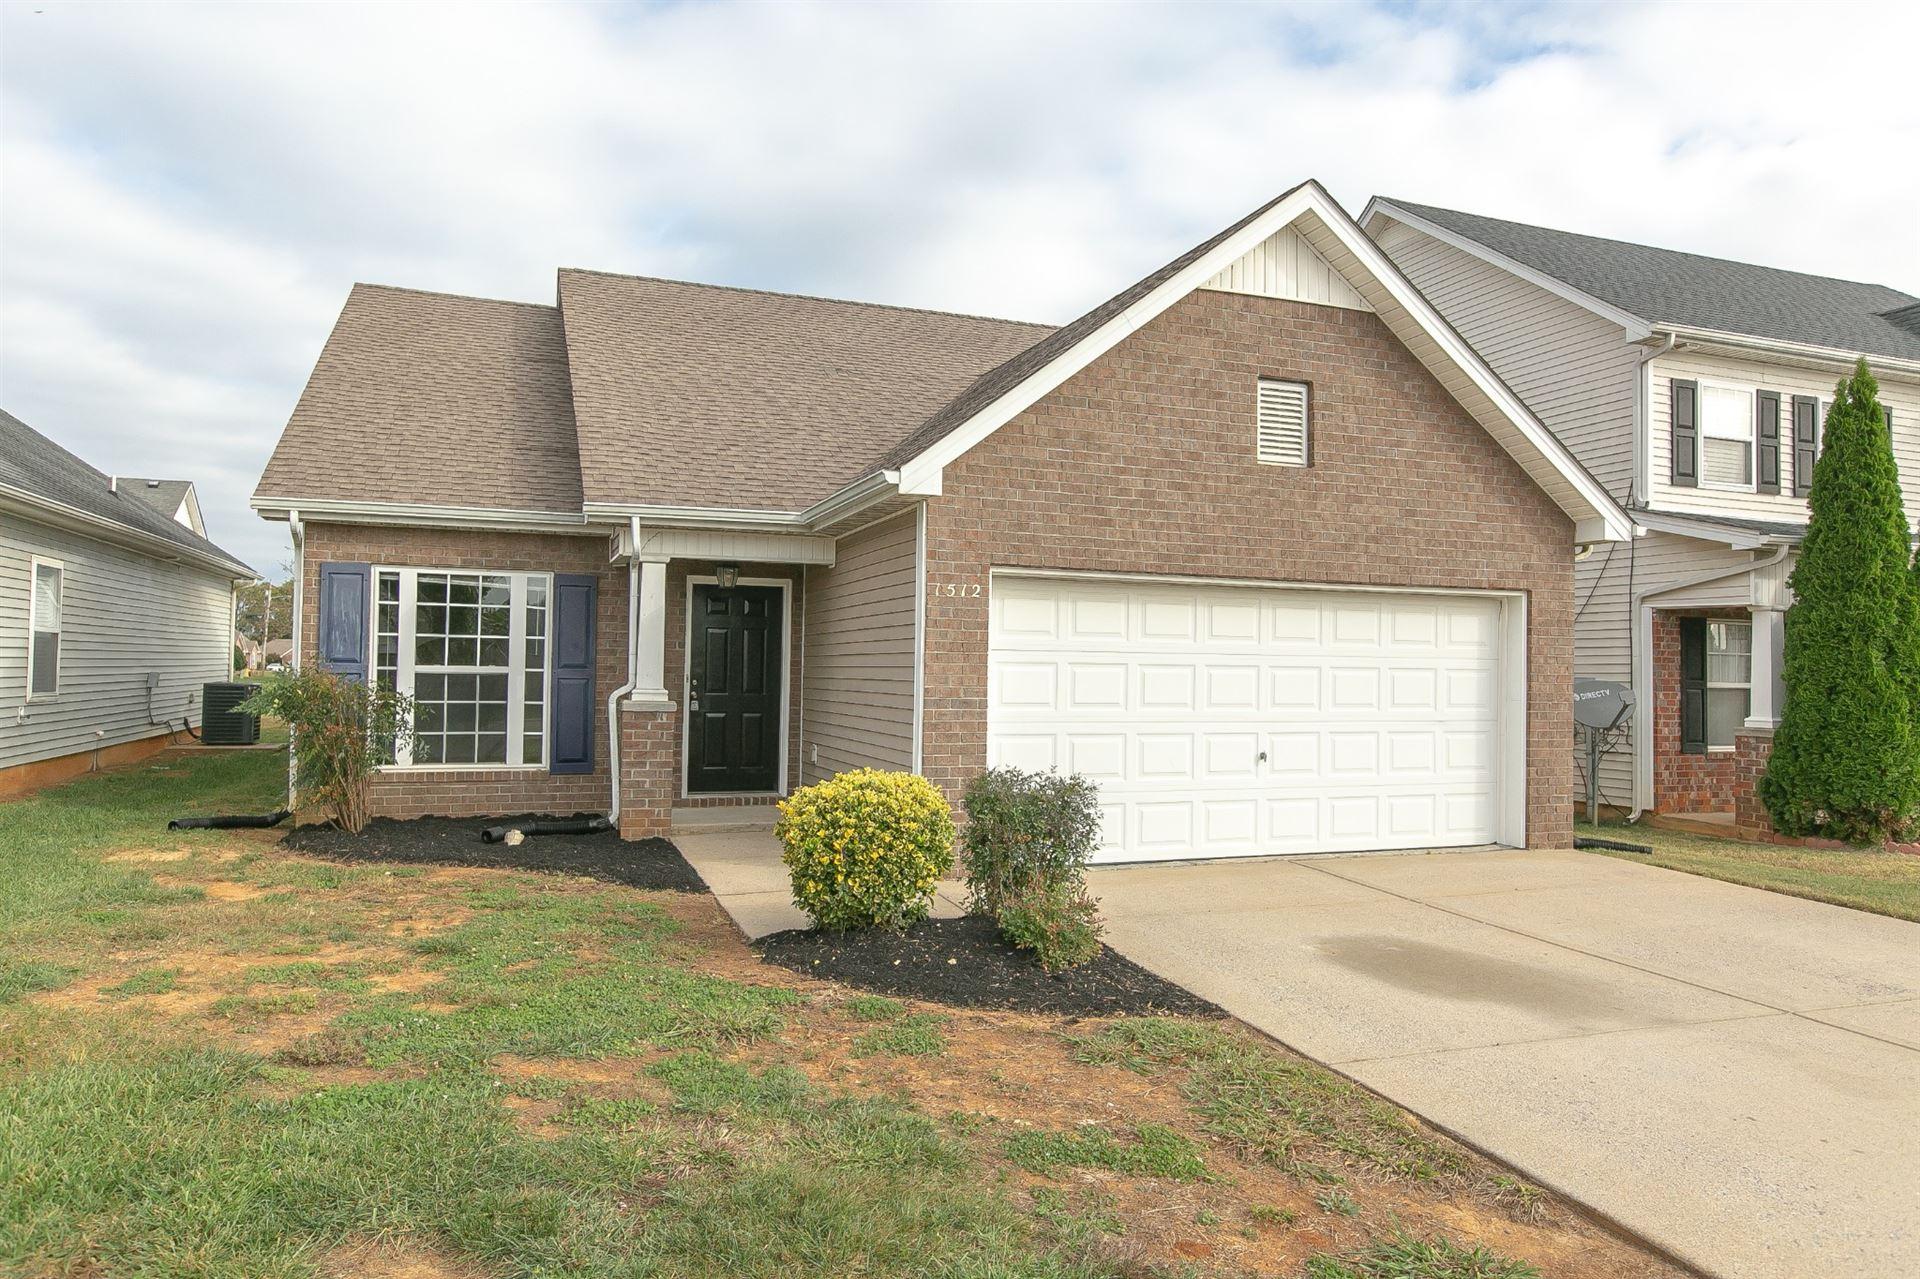 1512 Beaconcrest Cir, Murfreesboro, TN 37128 - MLS#: 2302821